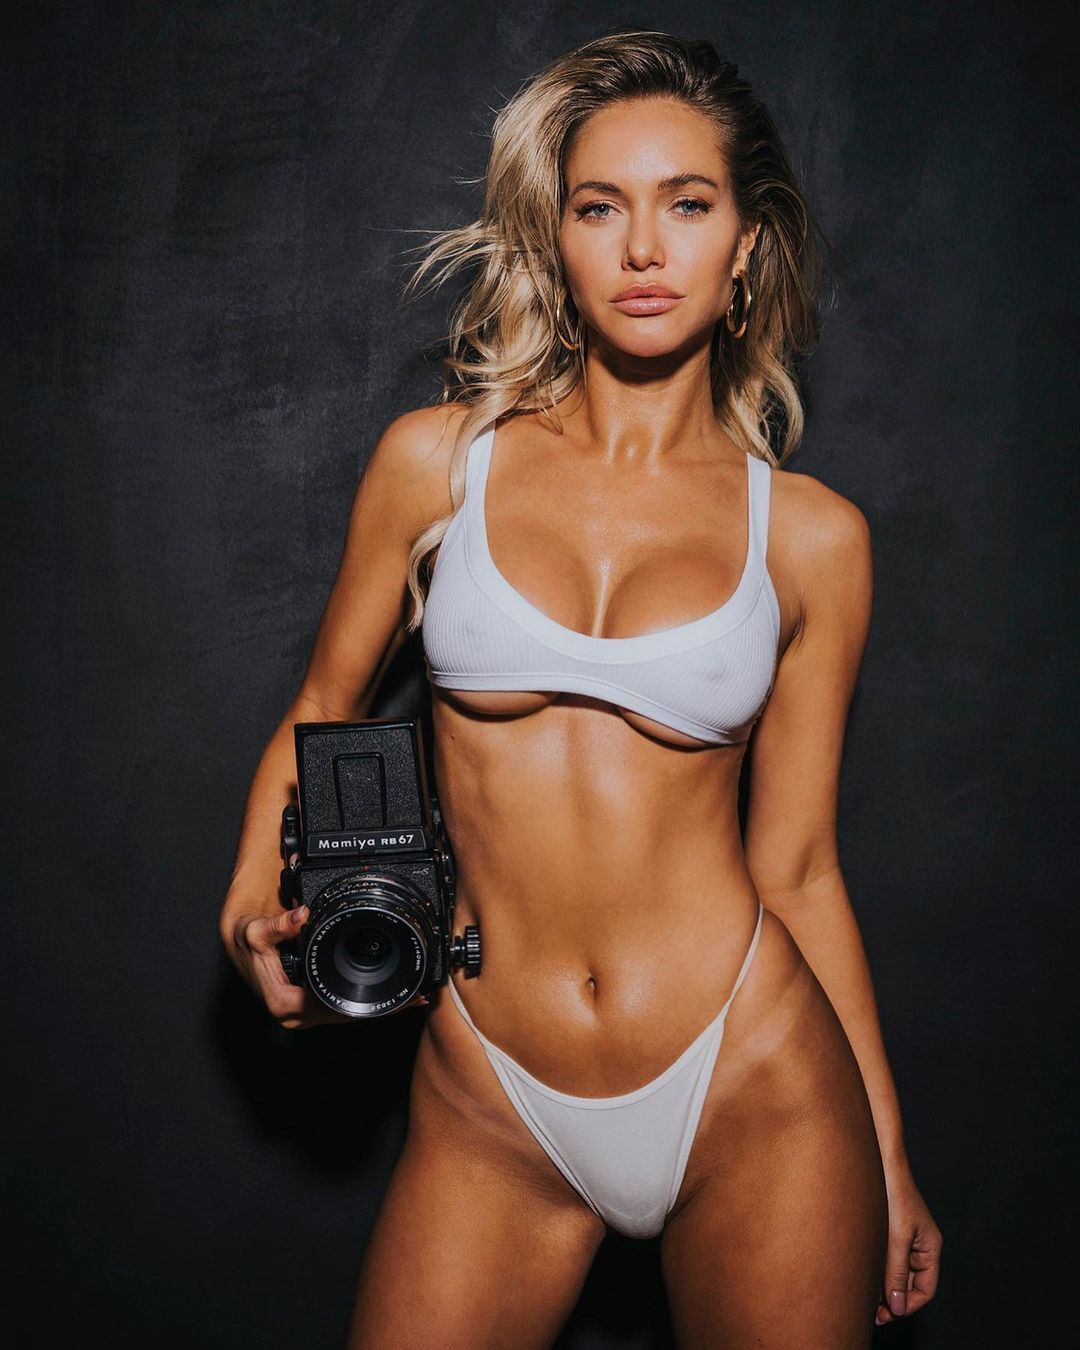 Кортни Келлар с камерой